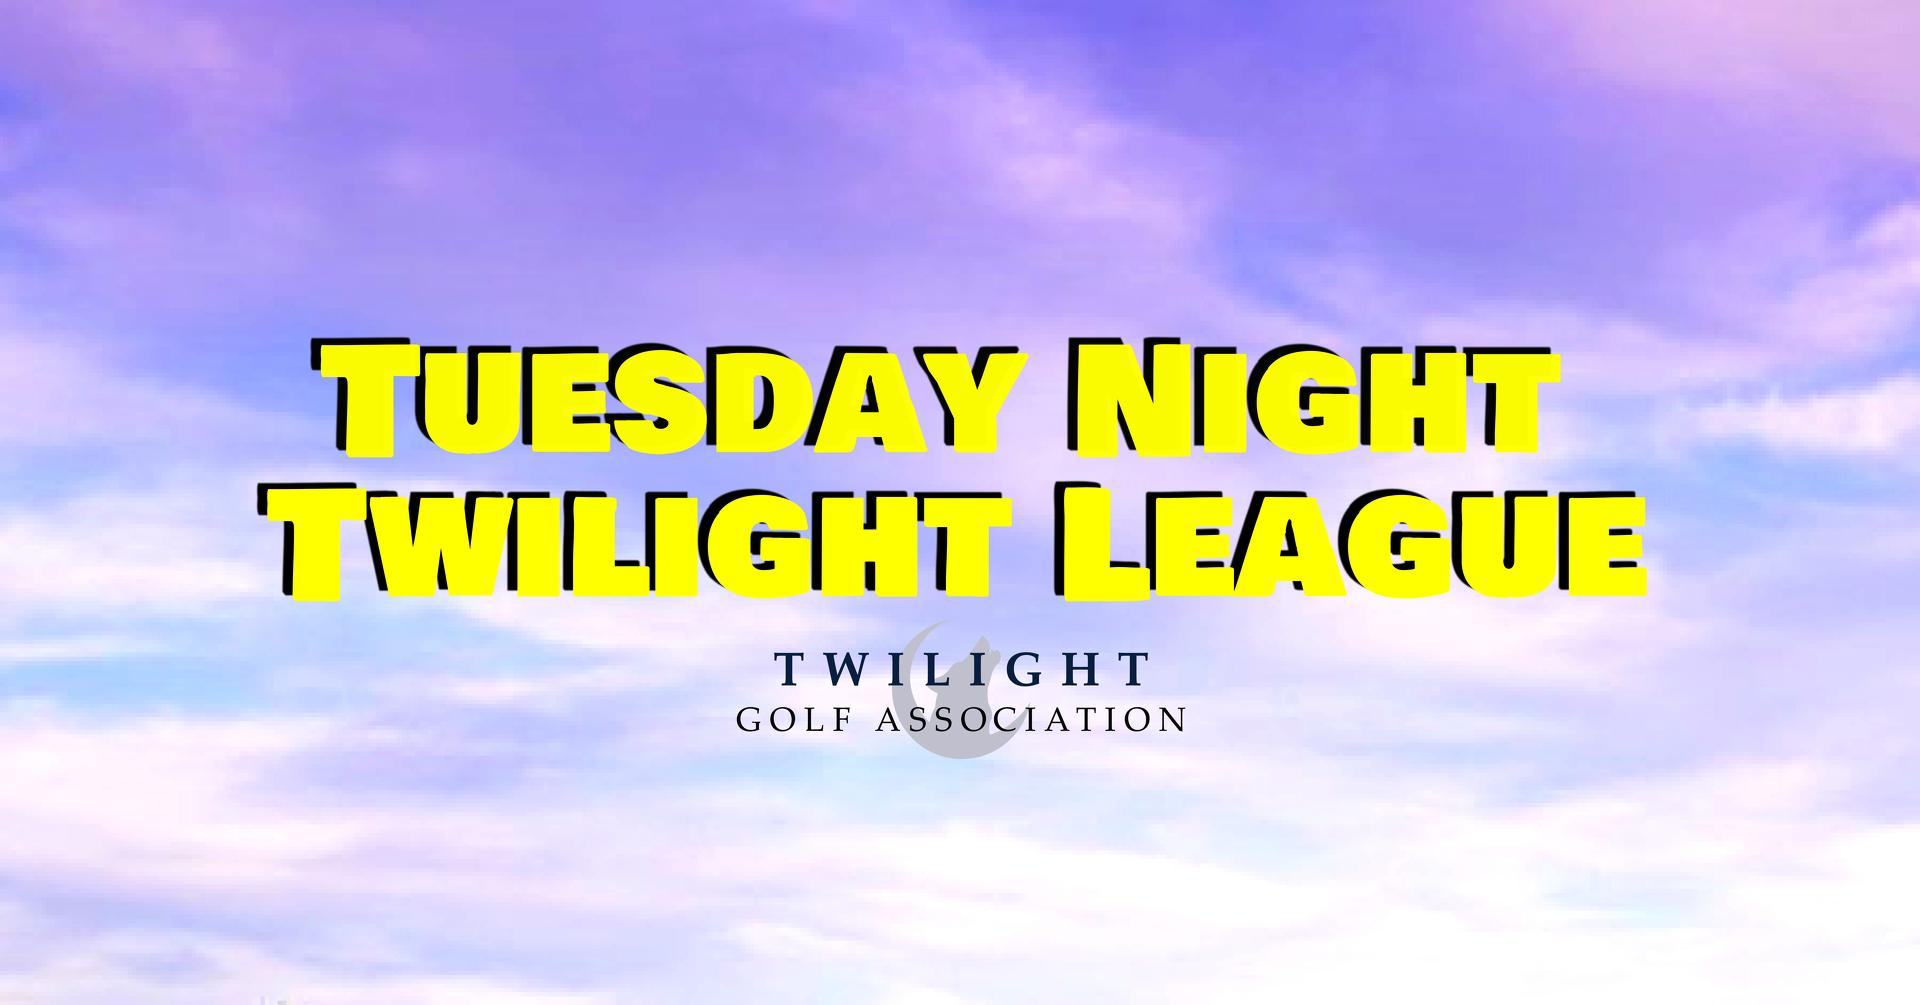 Tuesday Twilight League Richland Golf Club